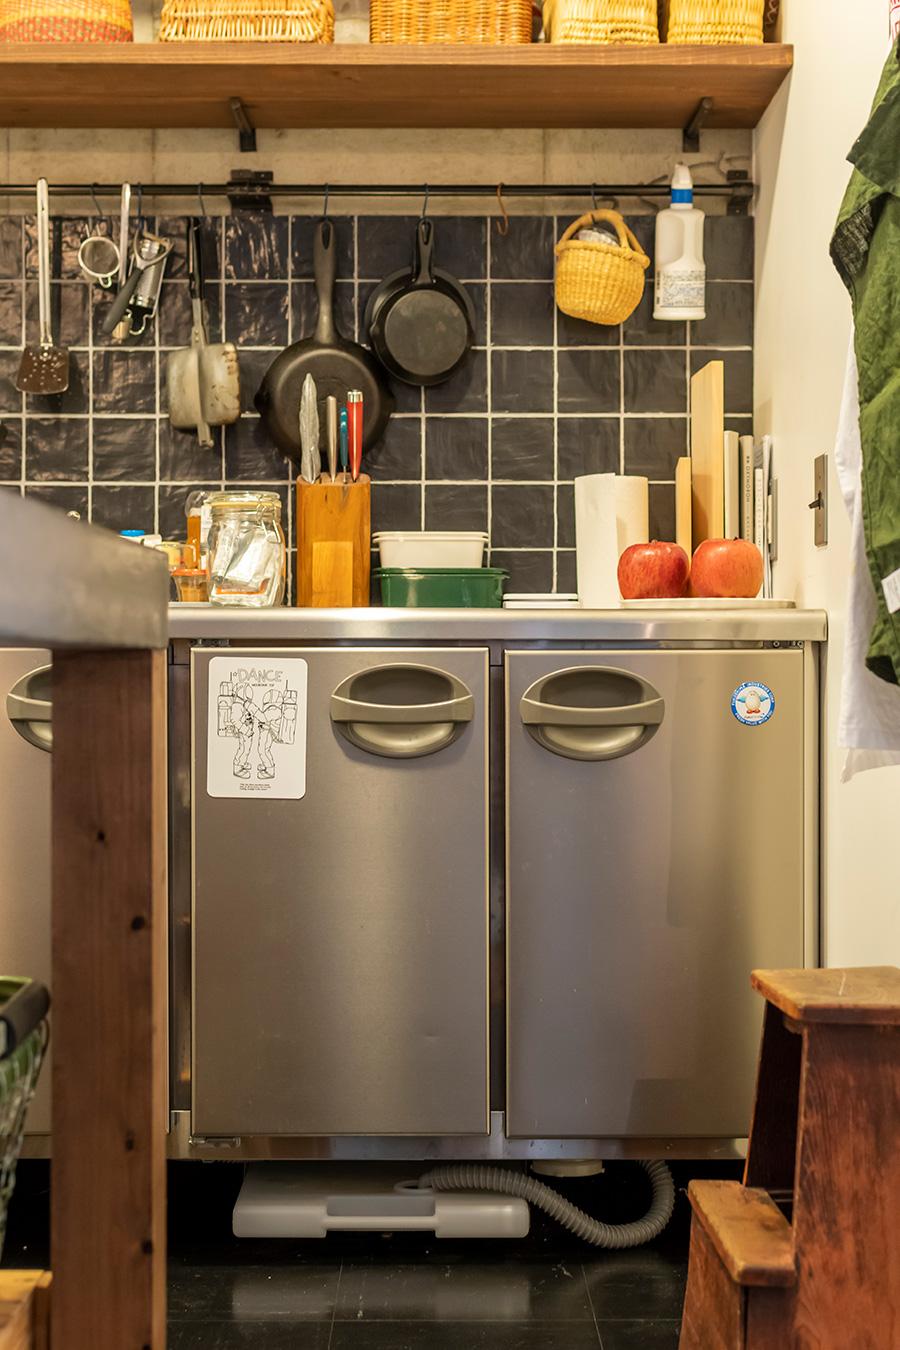 「FUKUSHIMA GALILEI」の業務用冷蔵庫。